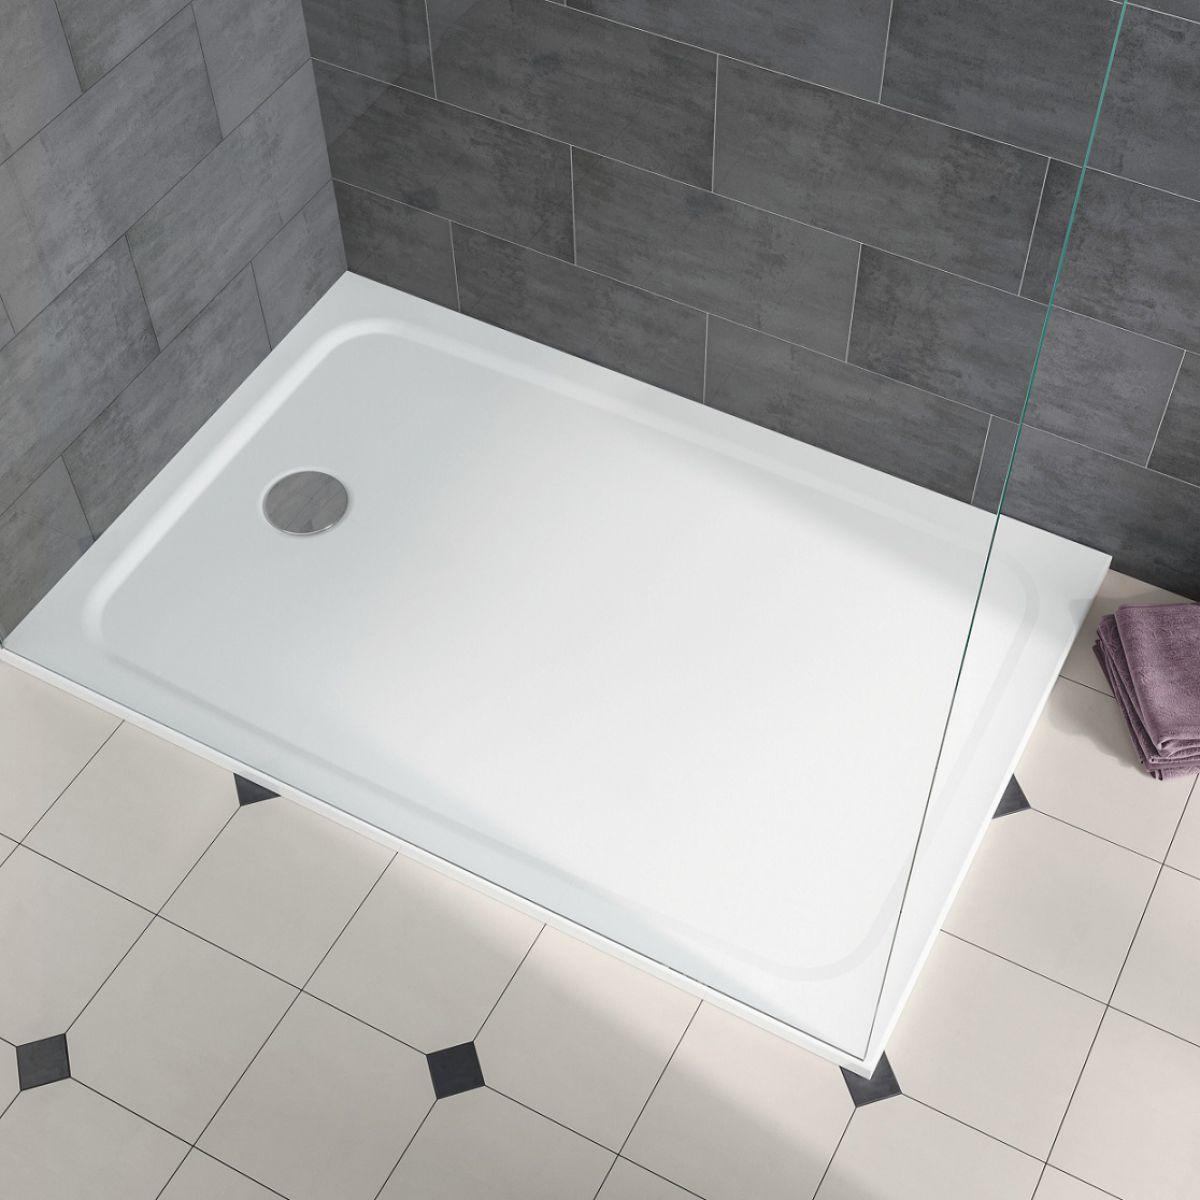 kaldewei cayonoplan rectangular shower tray uk bathrooms. Black Bedroom Furniture Sets. Home Design Ideas